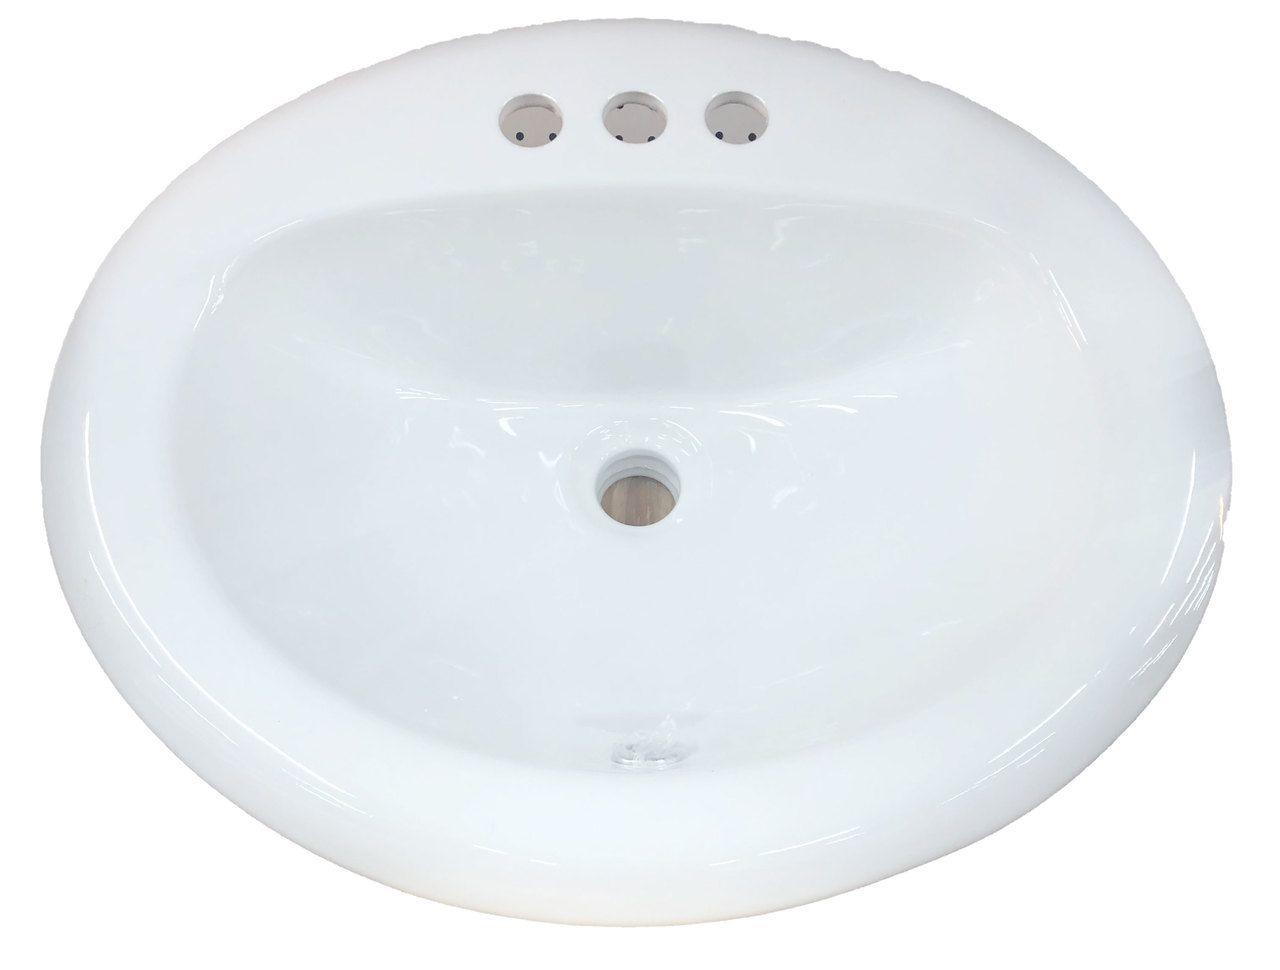 L2017 Above Counter Basin White Porcelain Bathroom Sink In 2020 Porcelain Bathroom Sink White Porcelain Basin White